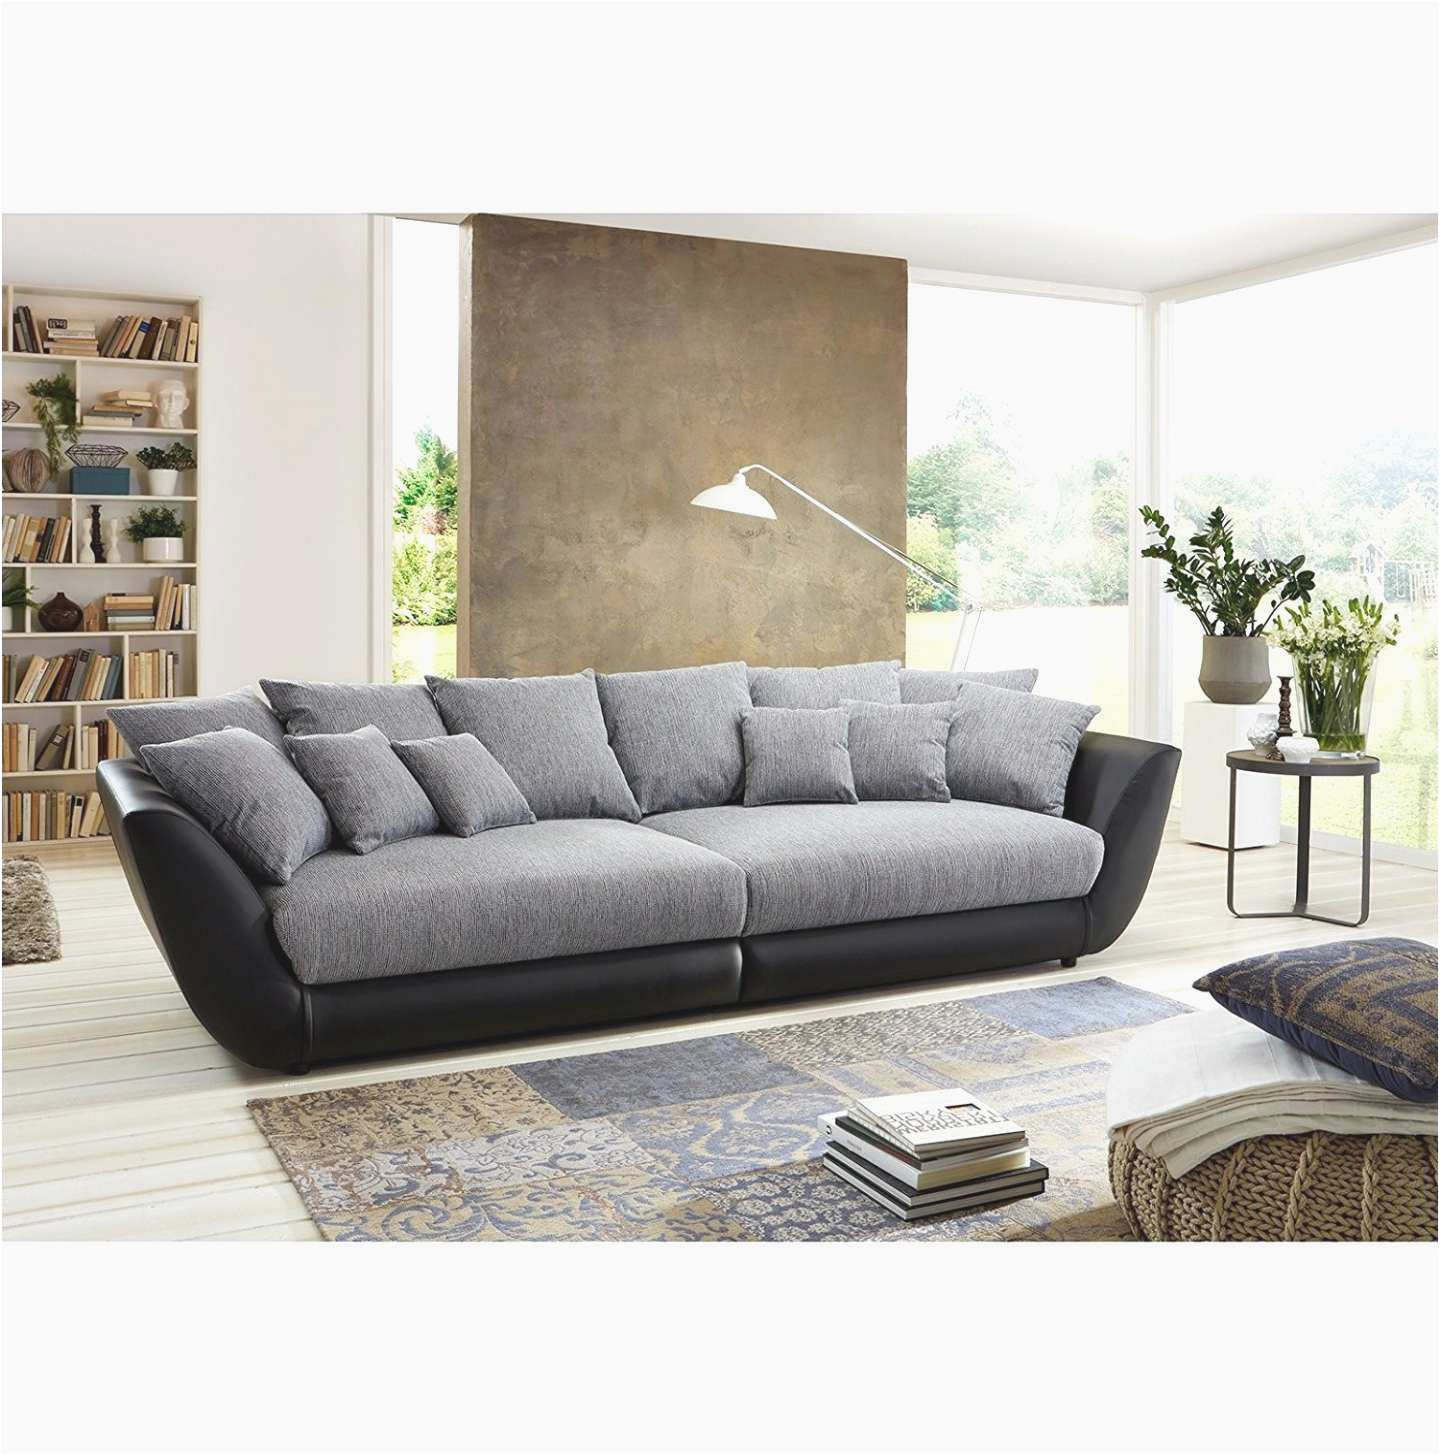 Furniture sofa Design sofa L form Frisch U sofa Xxl Schön Big sofa L form Luxus U